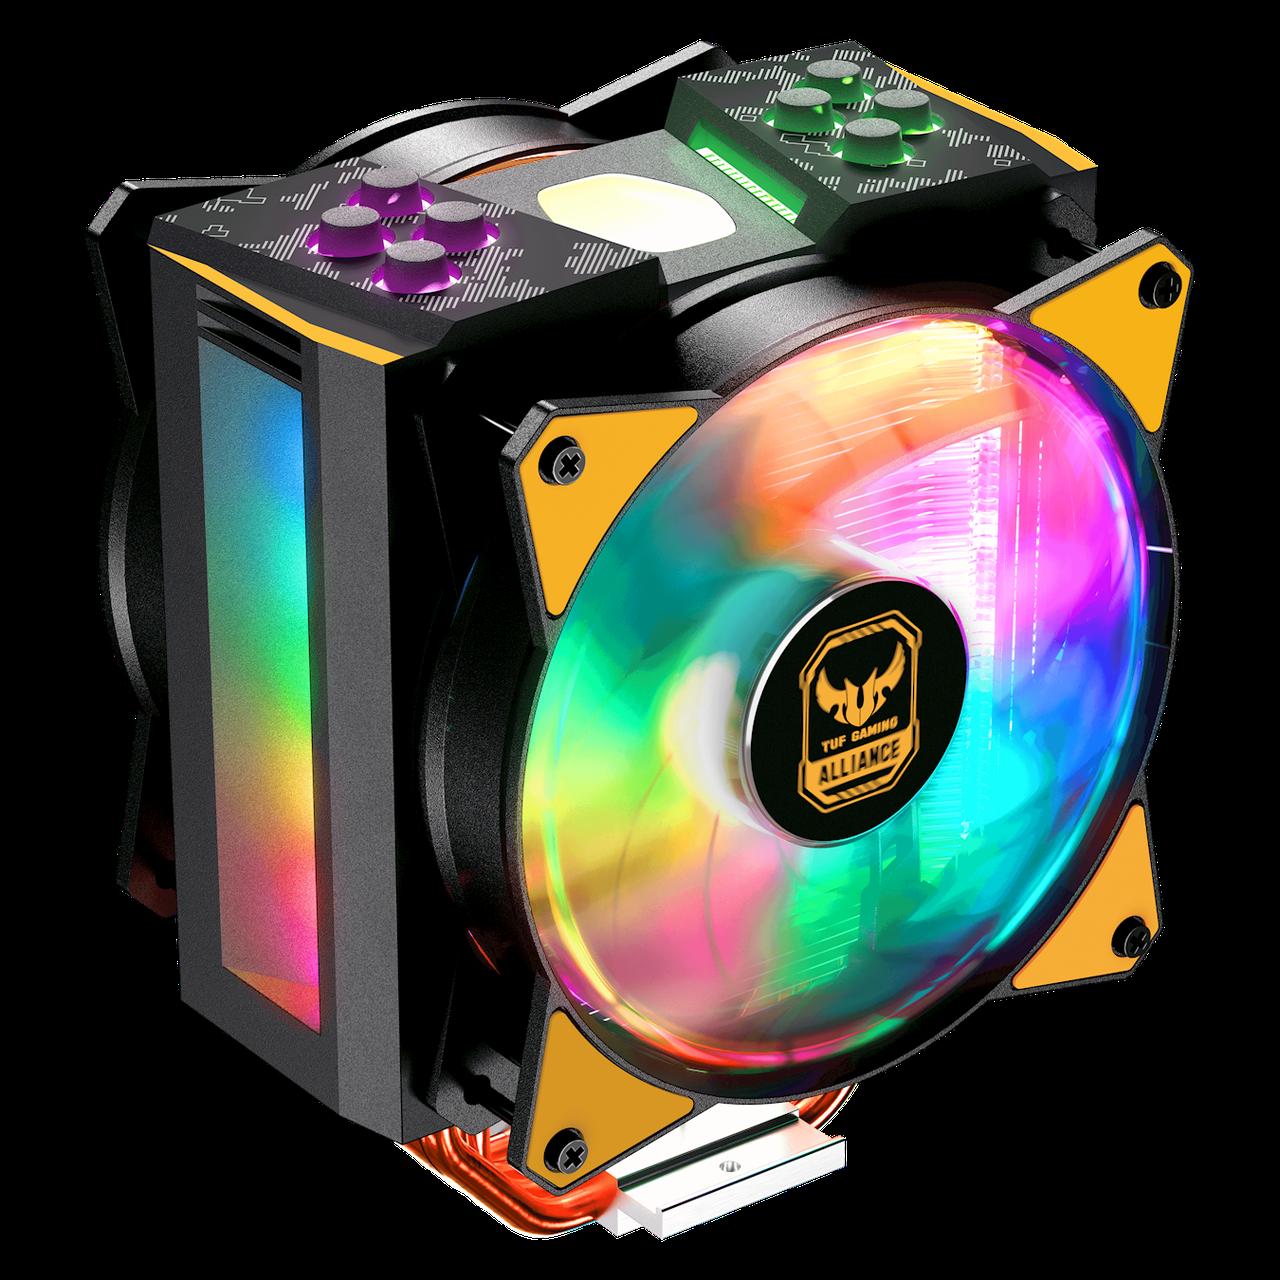 Вентилятор для CPU CoolerMaster MasterAir MA410M TUF